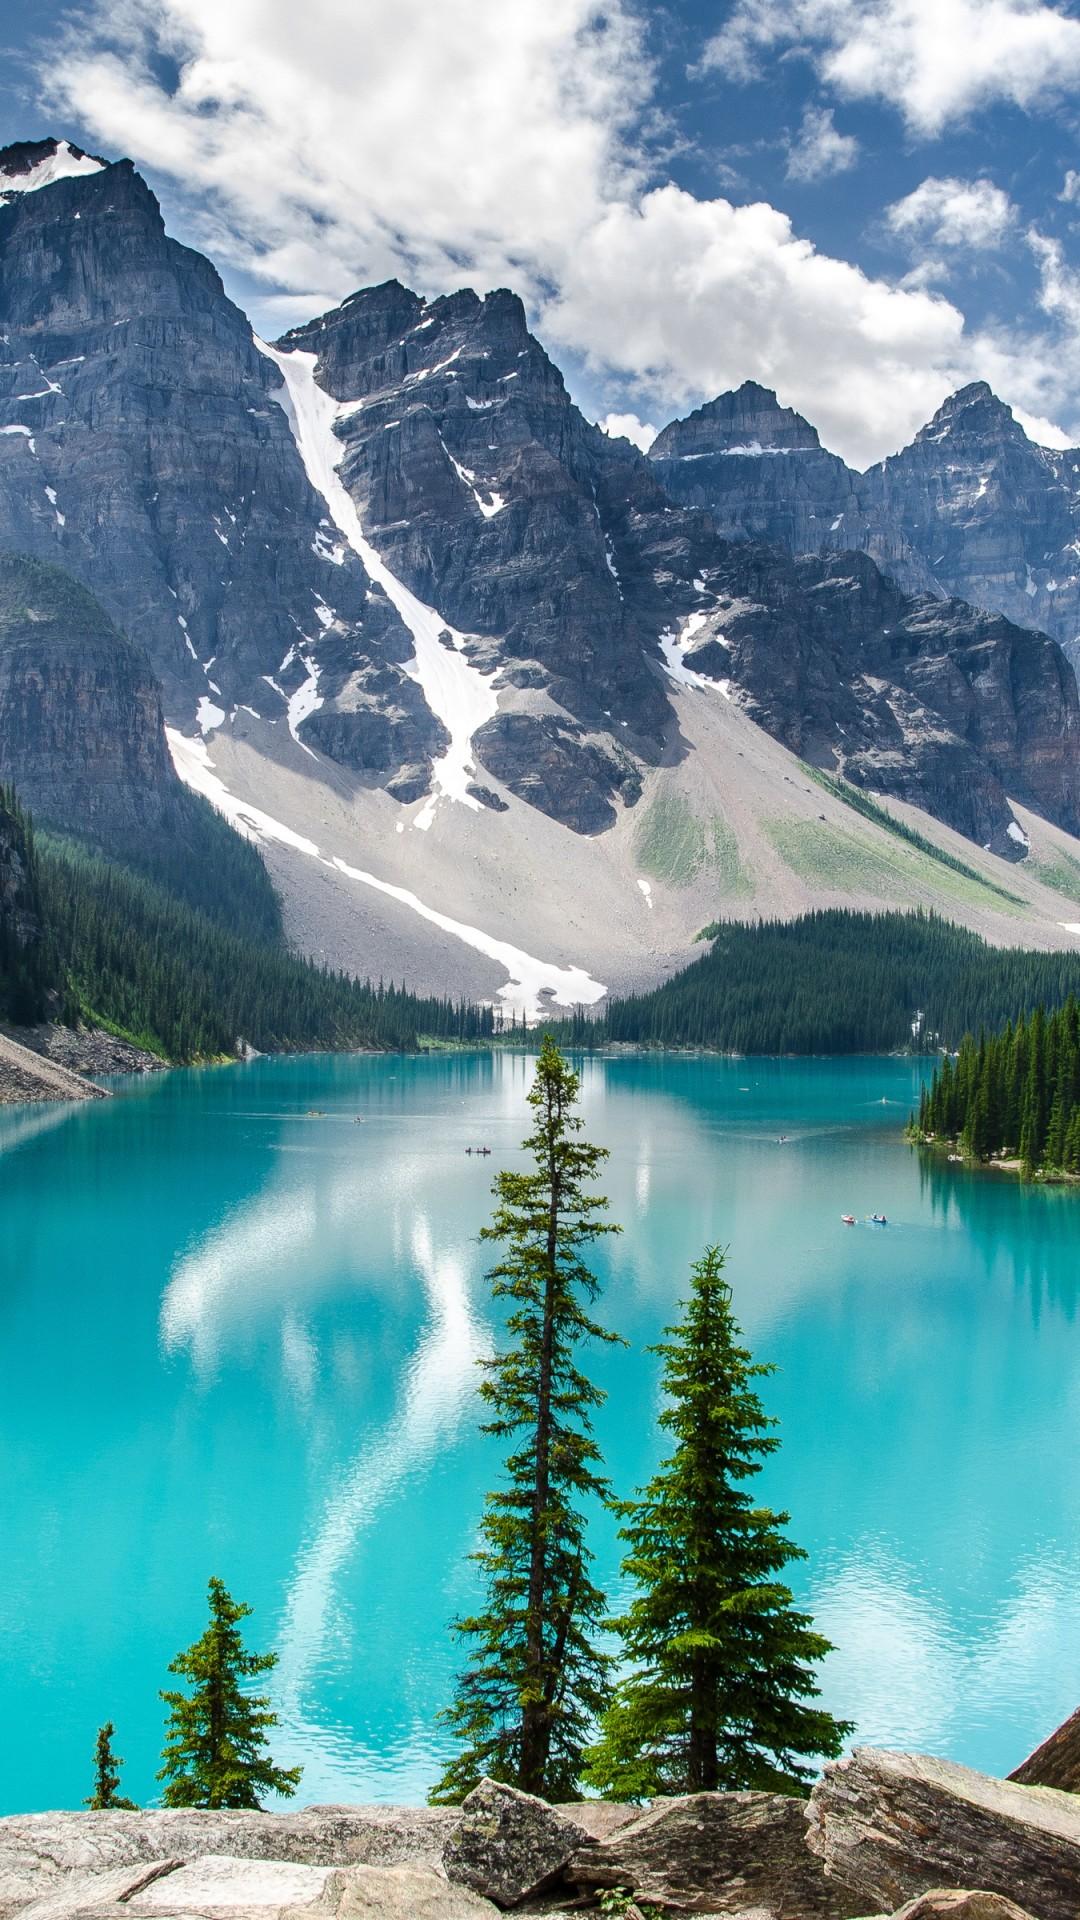 Wallpaper Moraine Lake 4k 5k Wallpaper Canada Mountains Lake